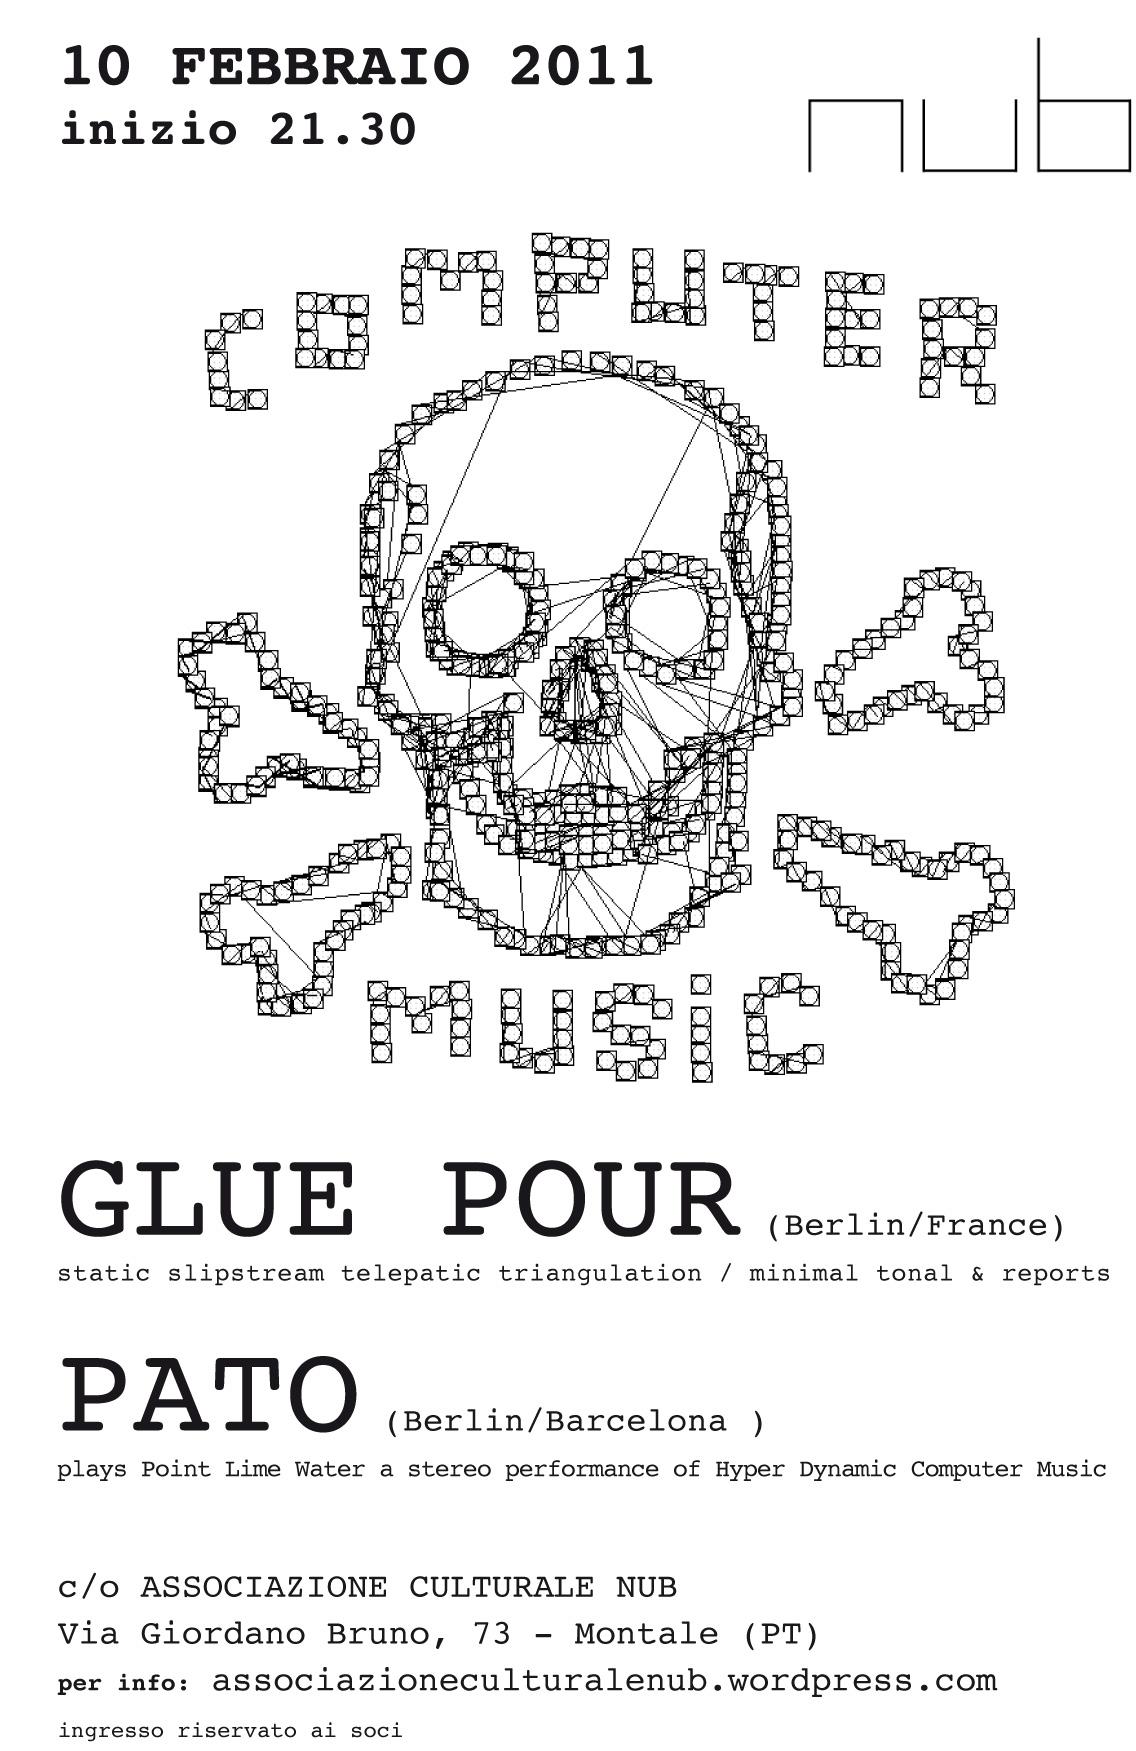 GLUE POUR / PATO | 10.02.2011